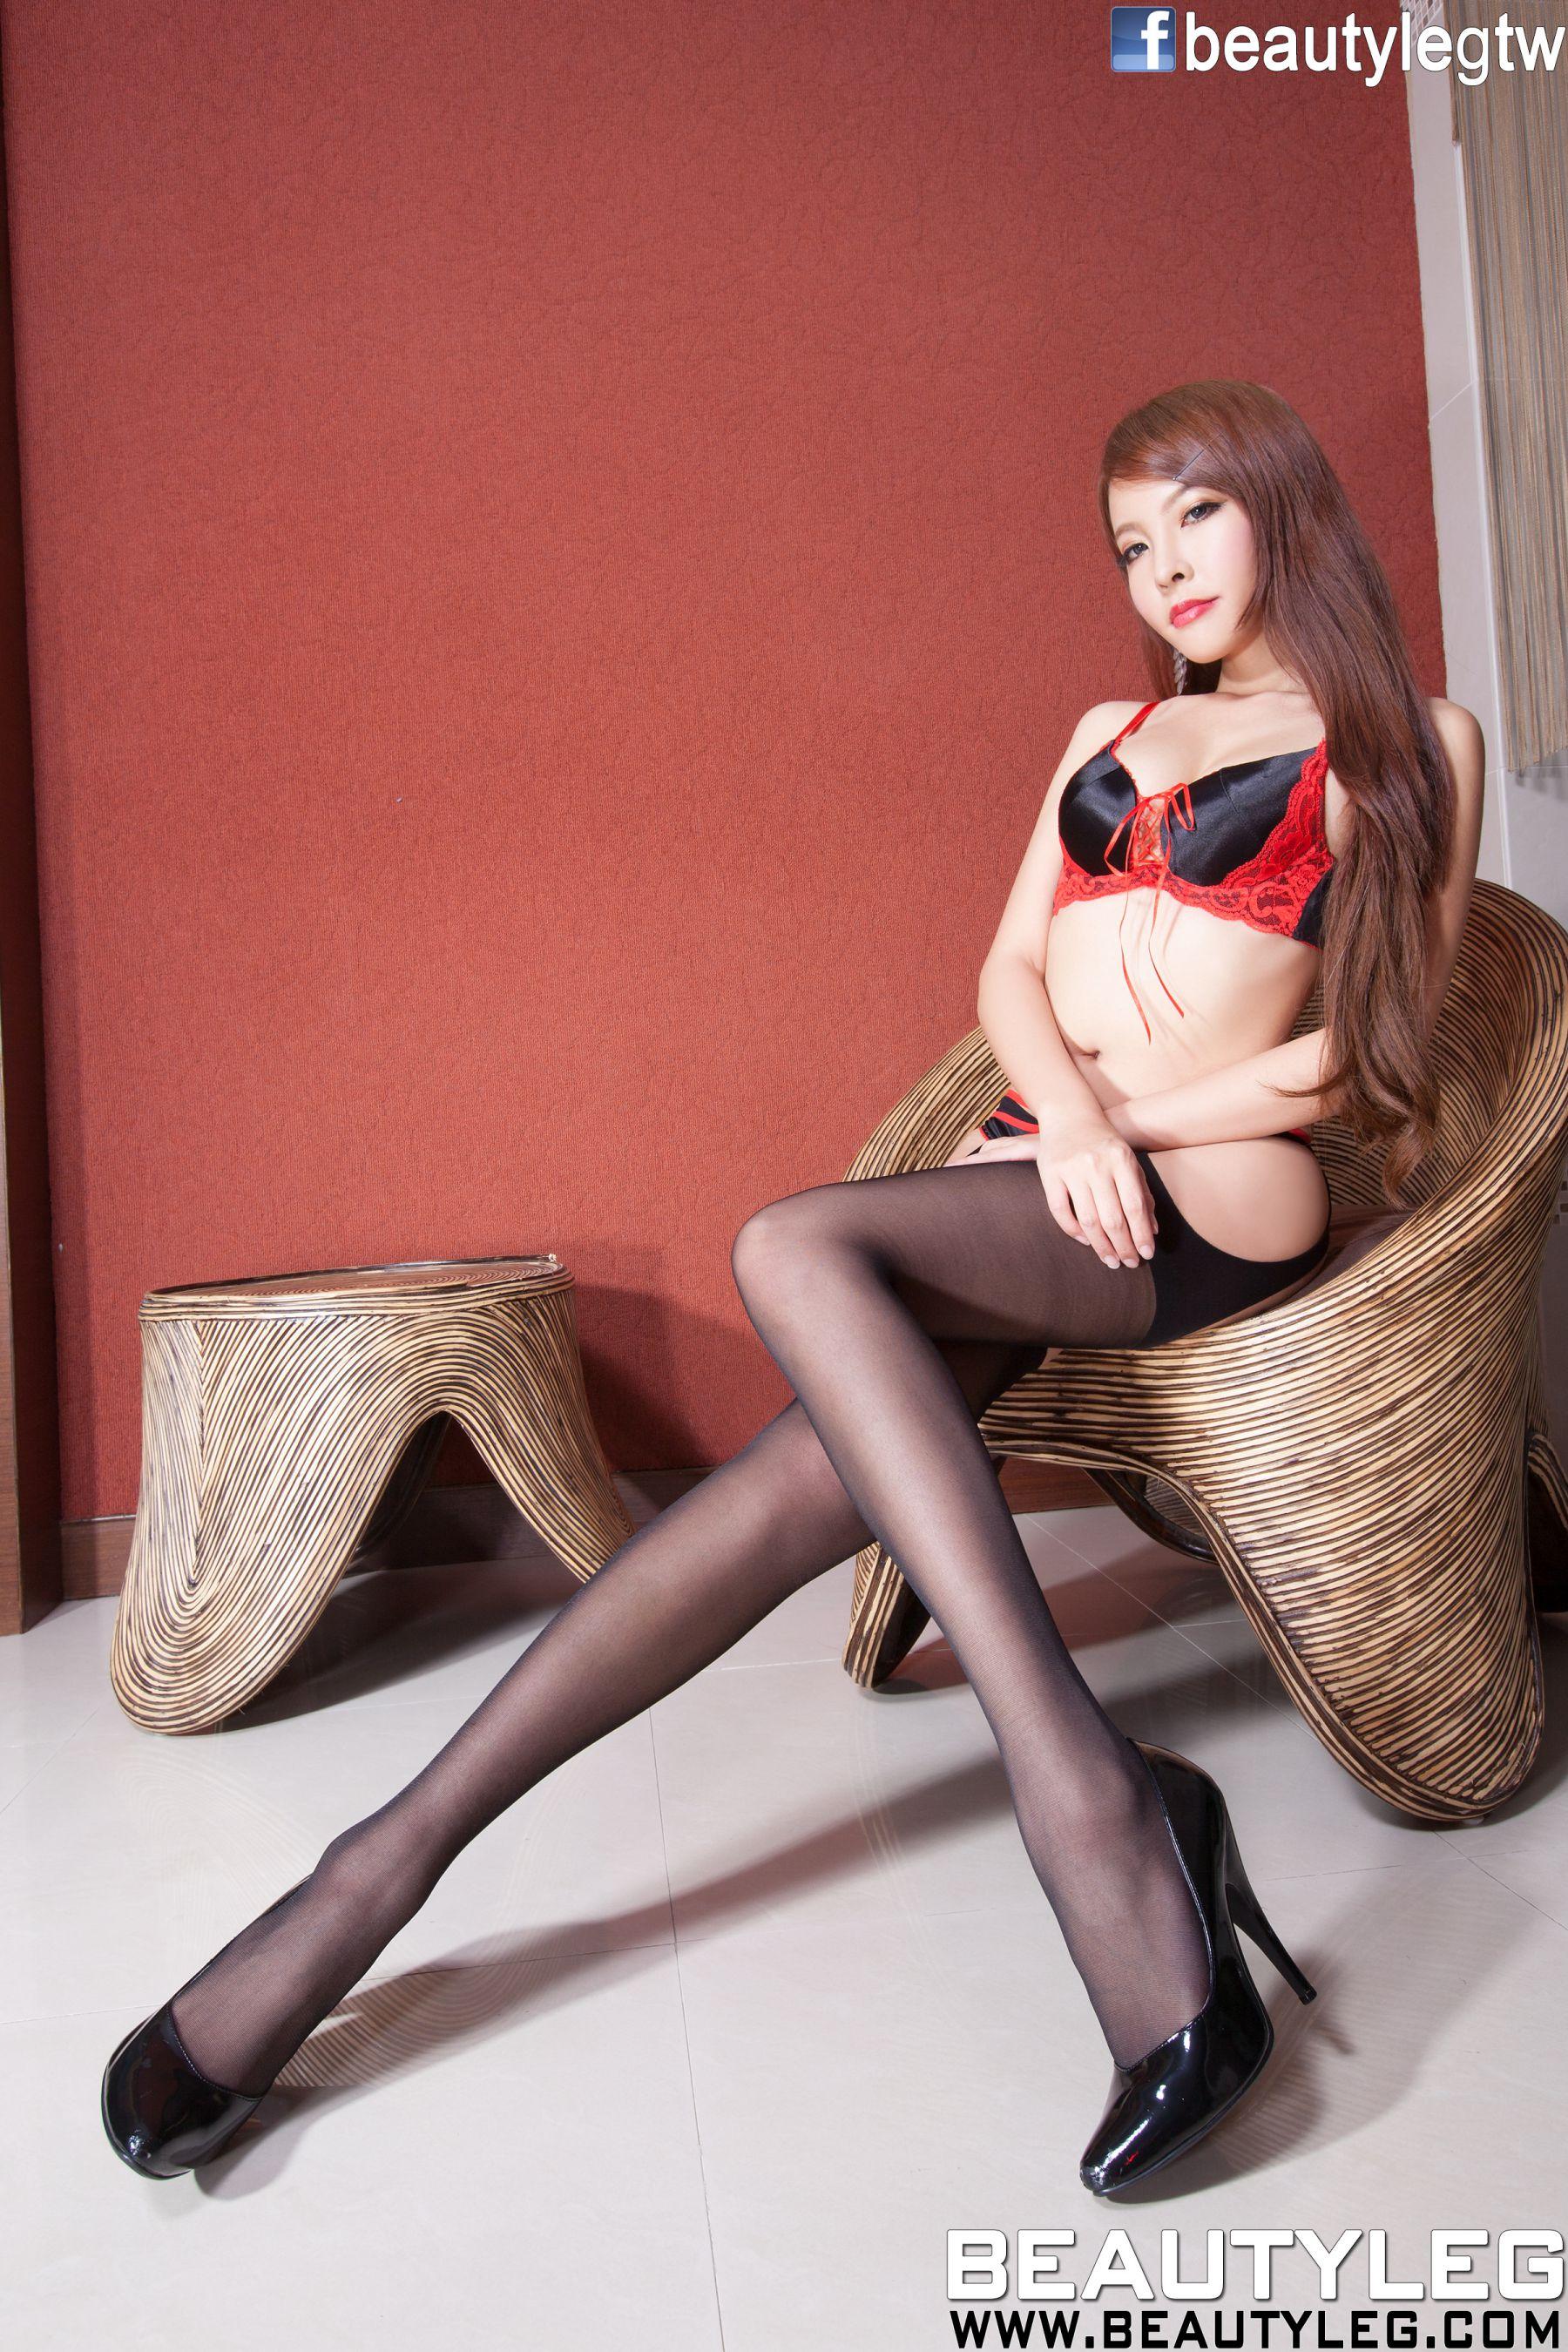 VOL.593 [Beautyleg]圣诞丝袜美腿内衣美女吊带丝袜情趣制服:翁雨澄(腿模Aileen)超高清个人性感漂亮大图(61P)